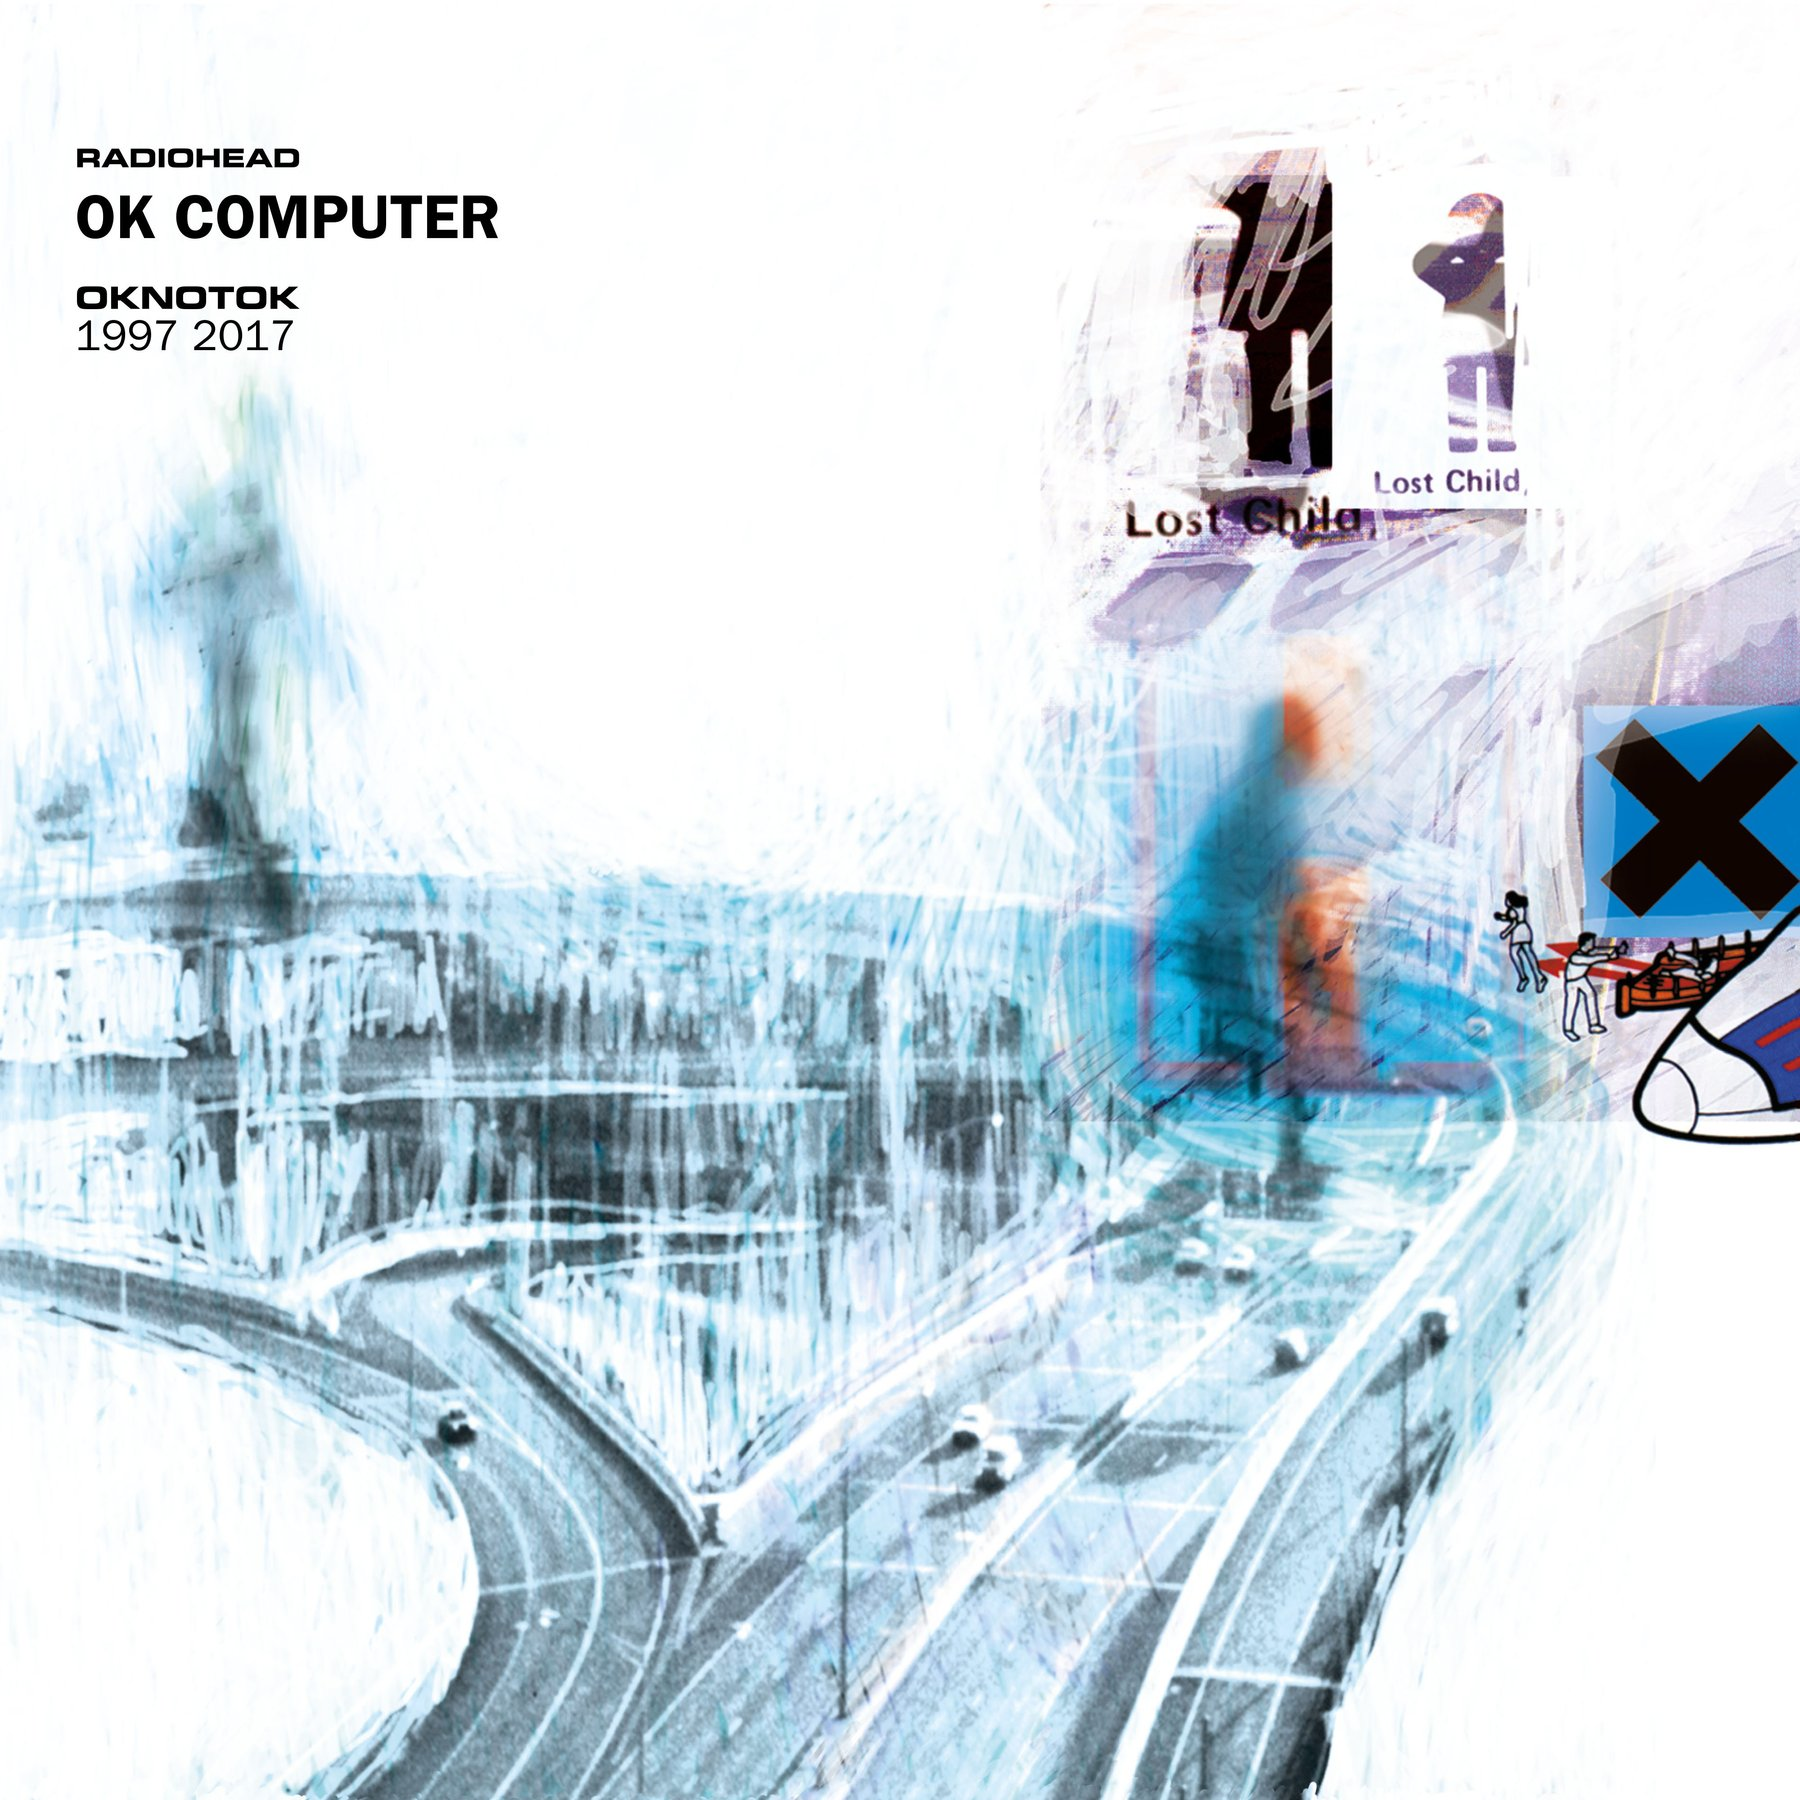 RADIOHEAD_ok_computer_OKNOTOK